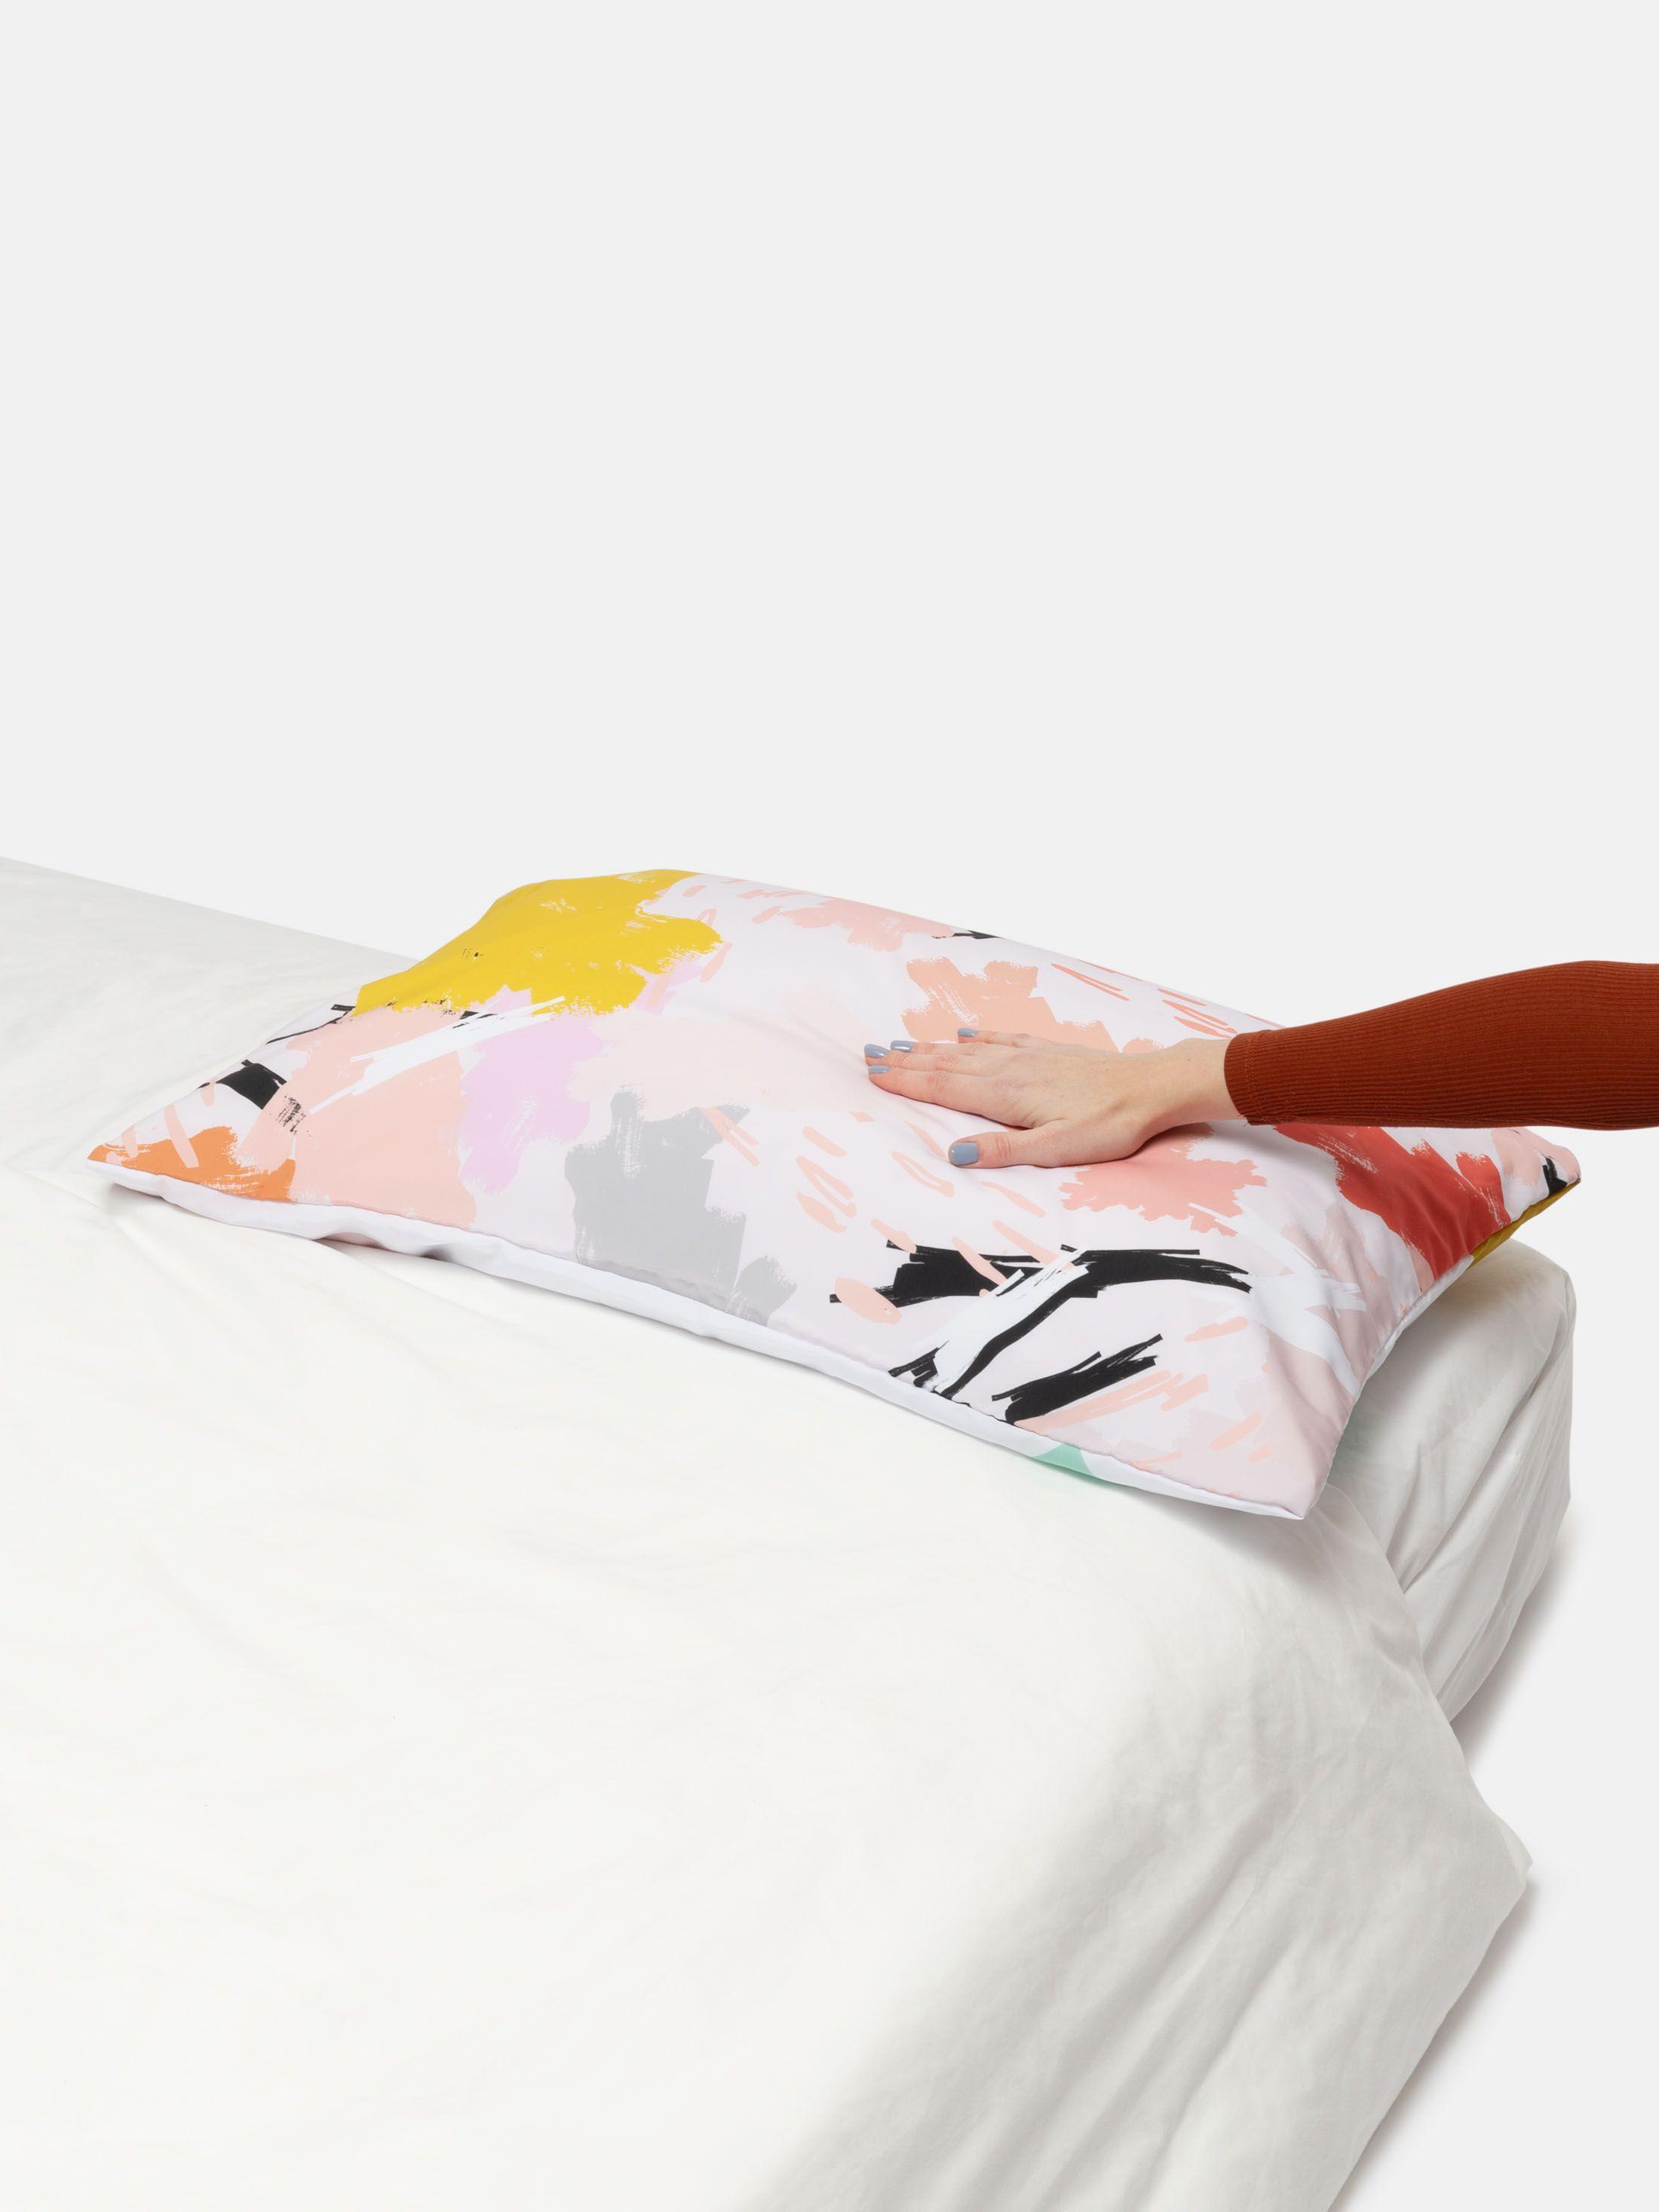 customised pillowcase slip and flap closure